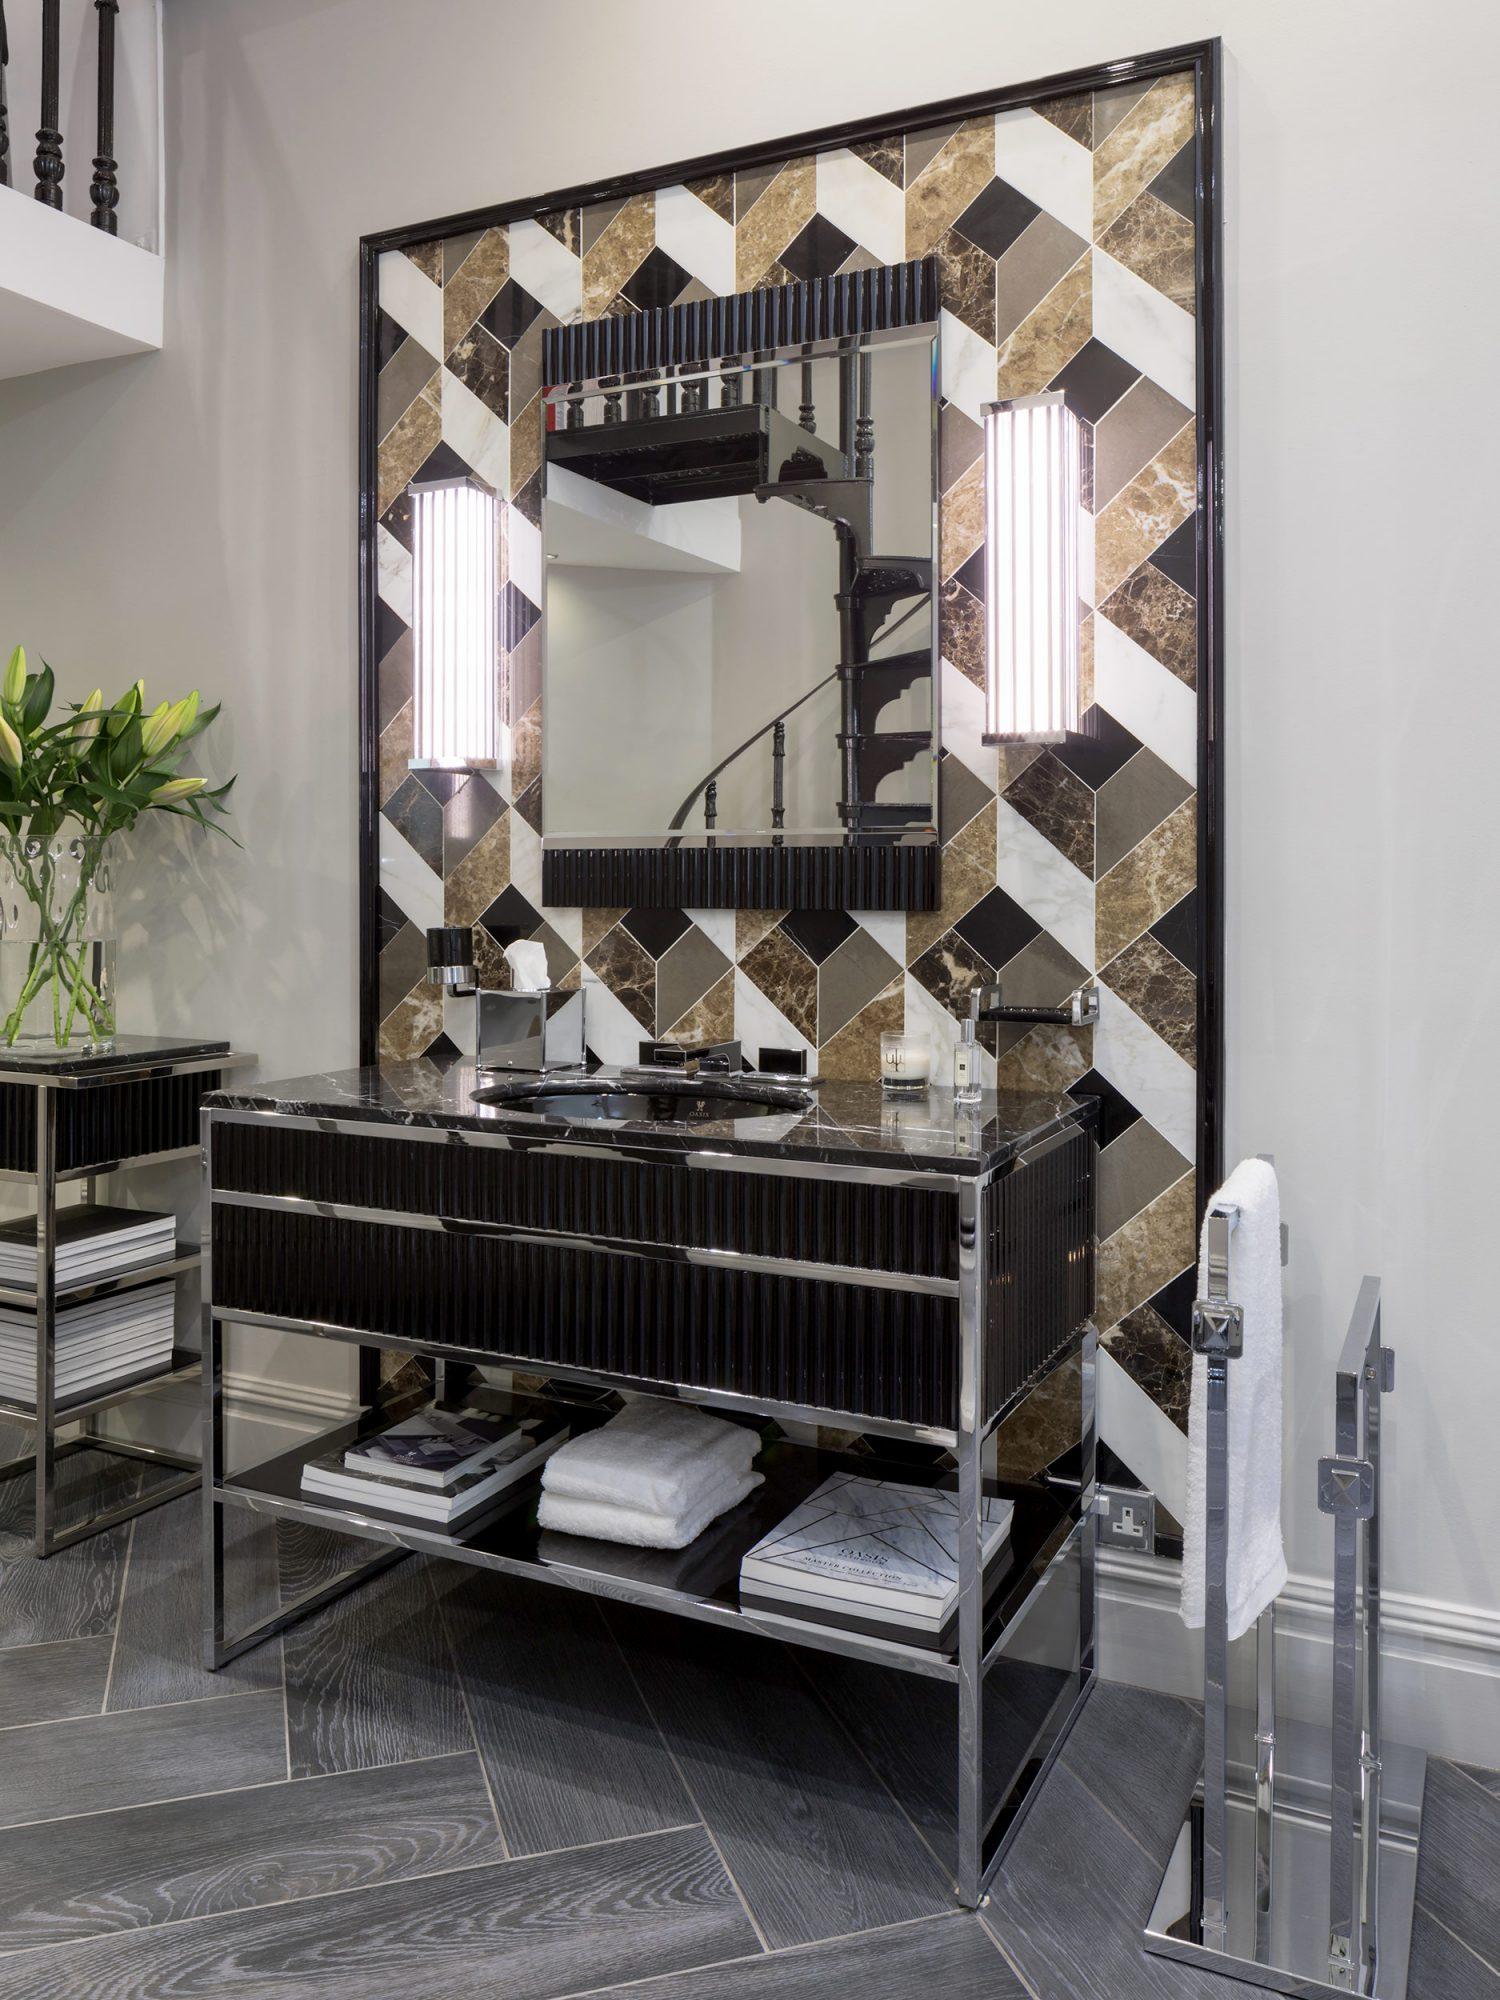 West One Bathrooms Knightsbridge Showroom Thurloe Place 3b